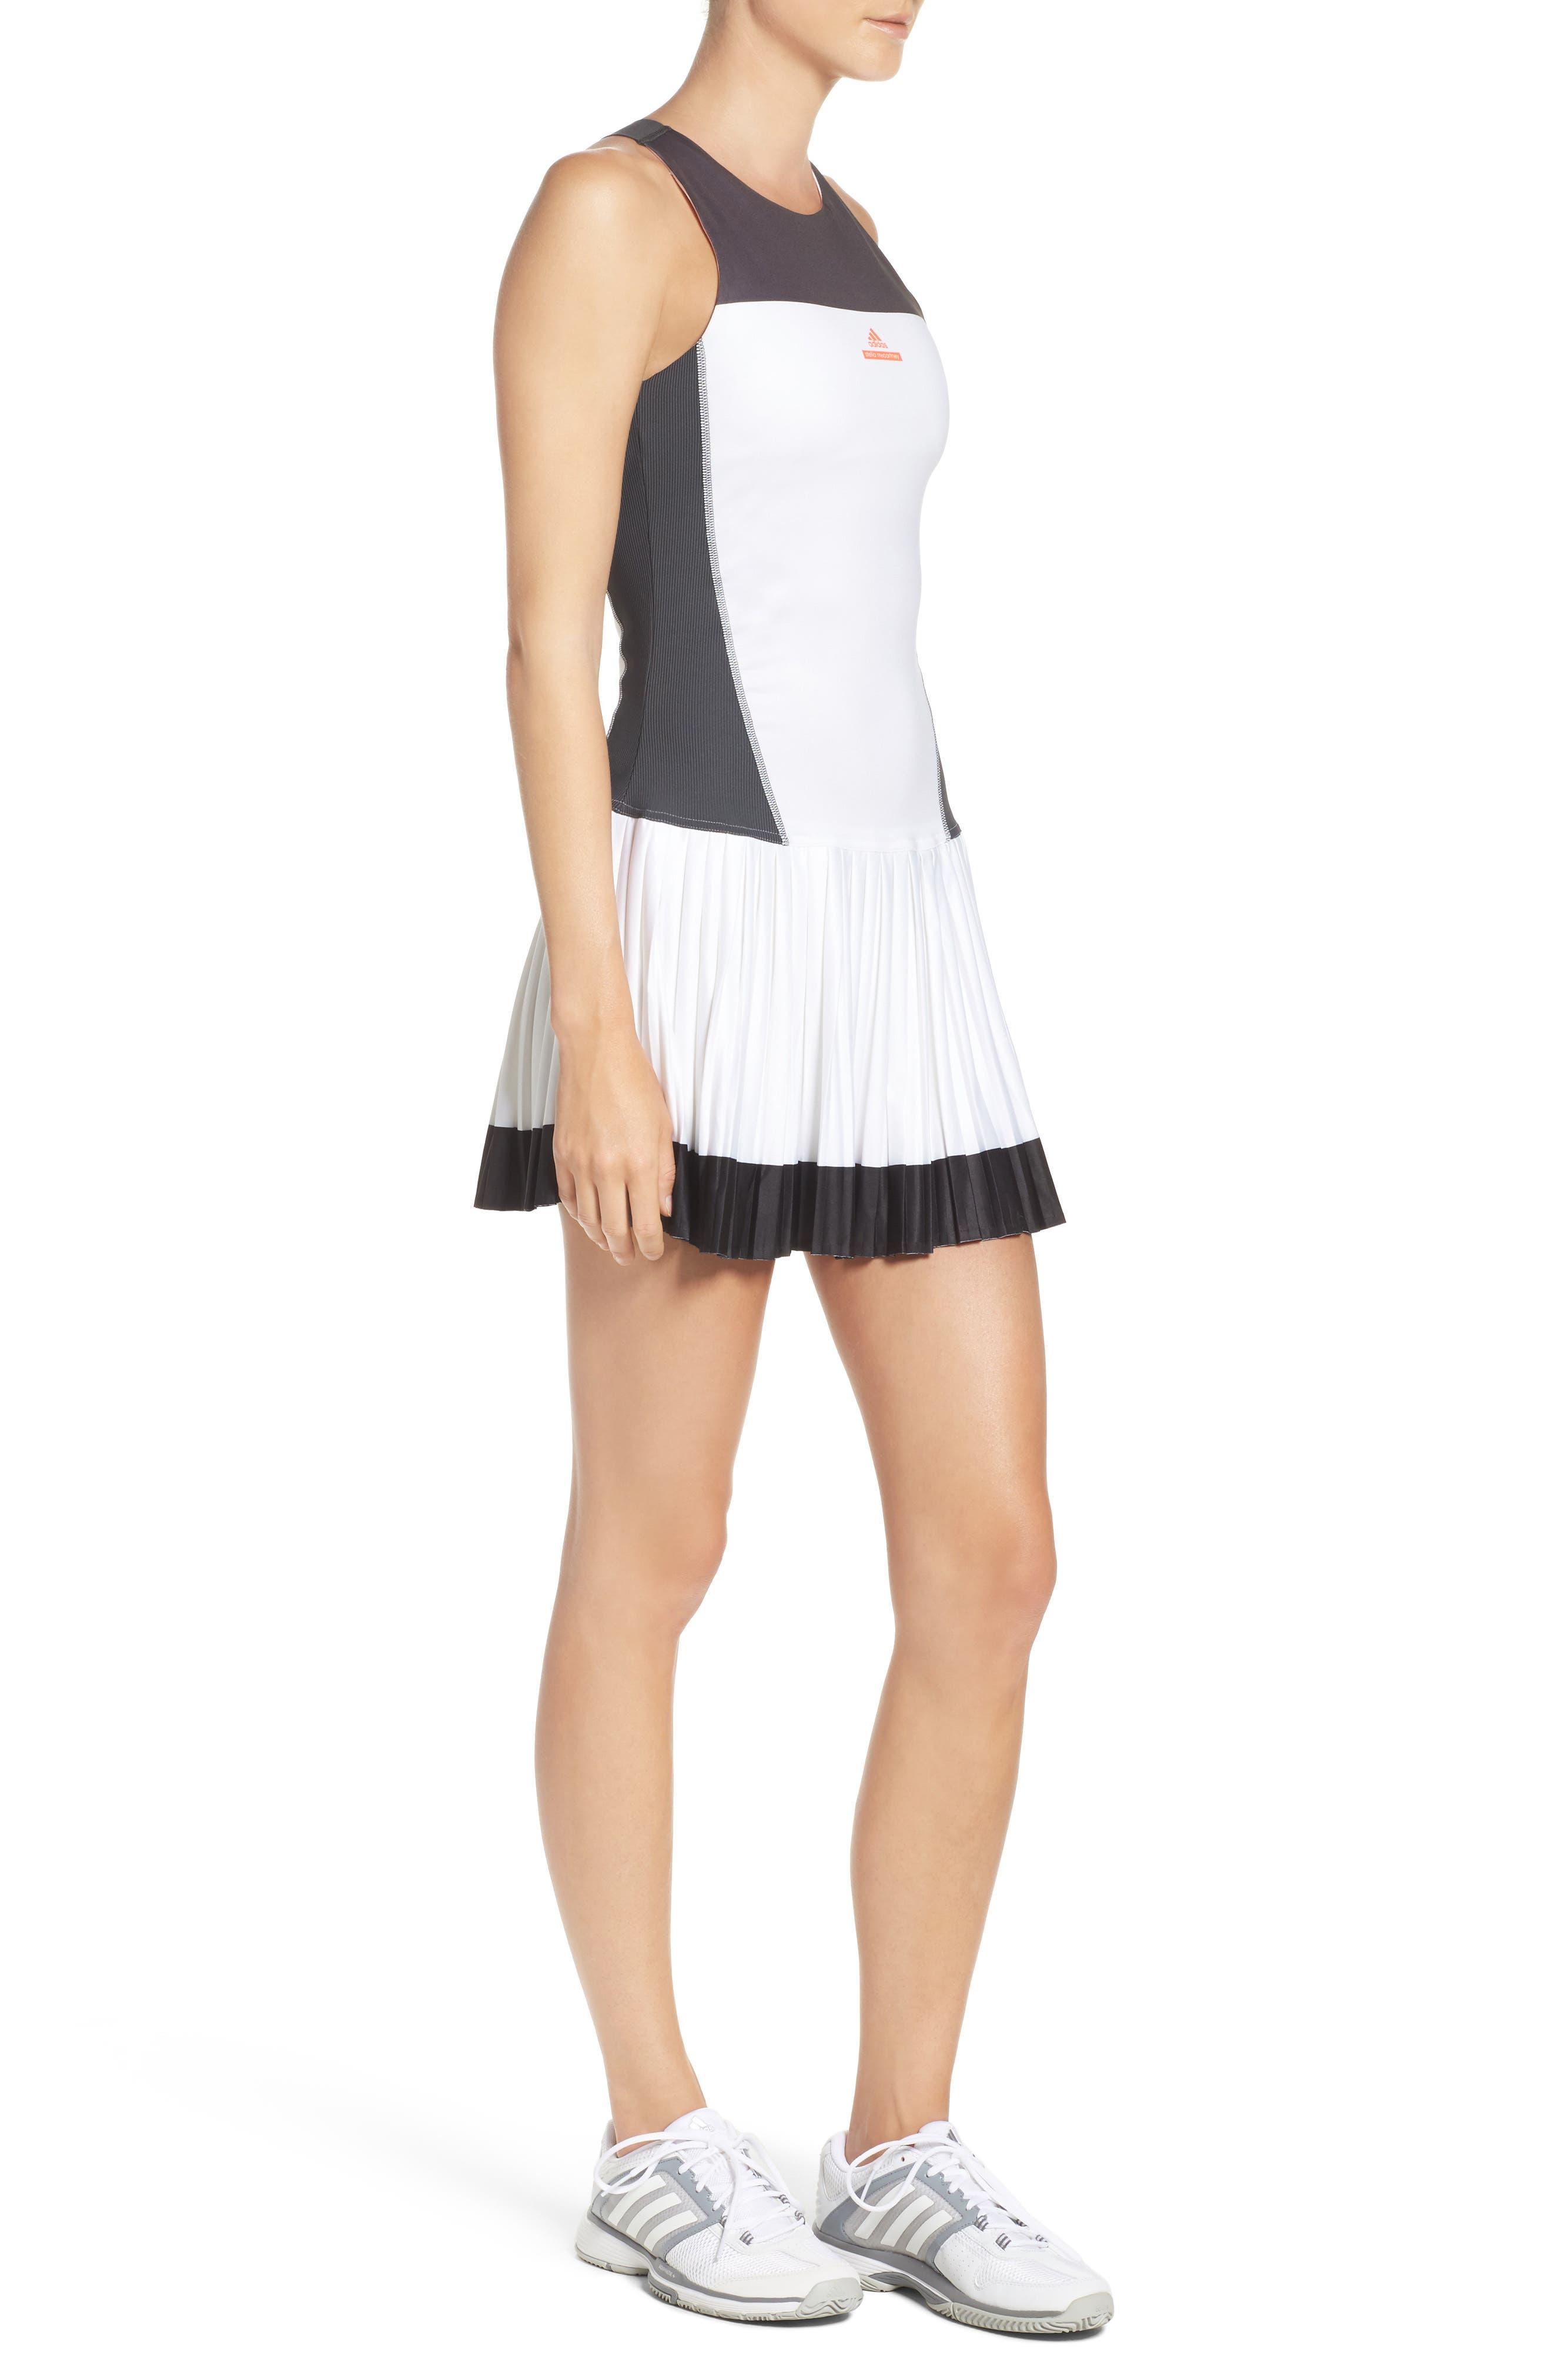 Barricade Tennis Dress & Shorts Set,                             Alternate thumbnail 3, color,                             White/ Solid Grey